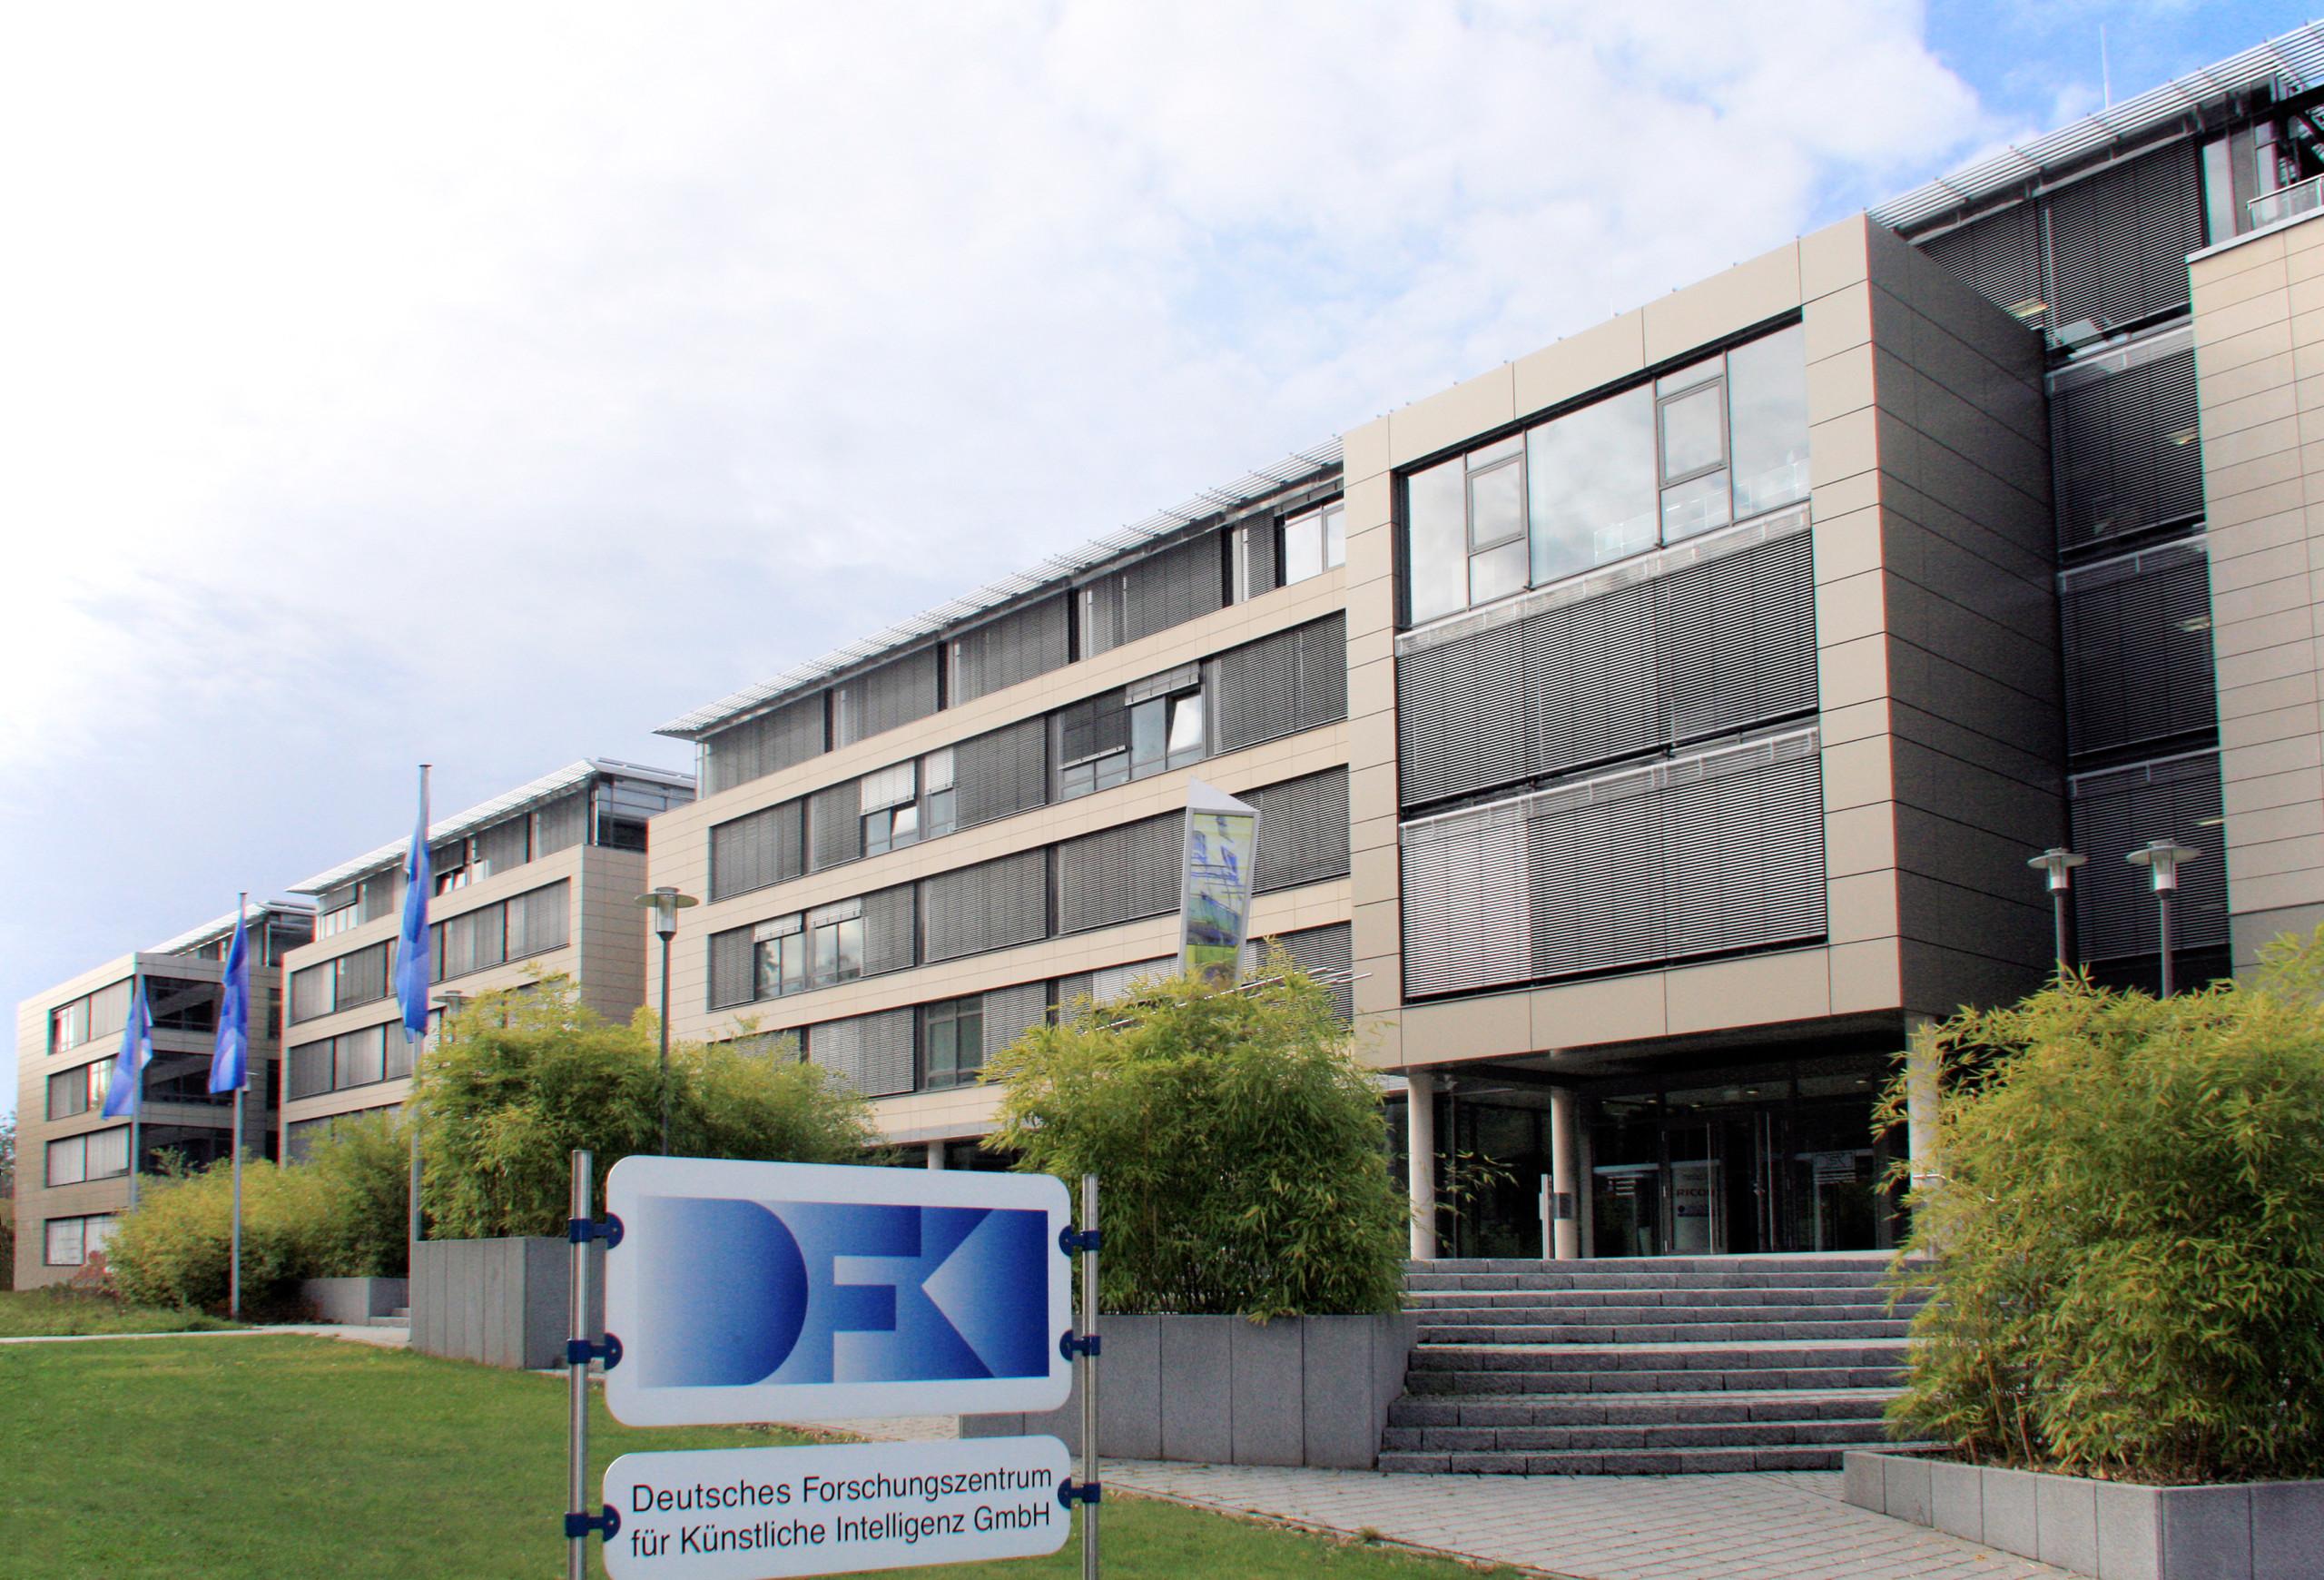 هوش مصنوعی در آلمان: Forschungsinstitut für Künstliche Intelligenz